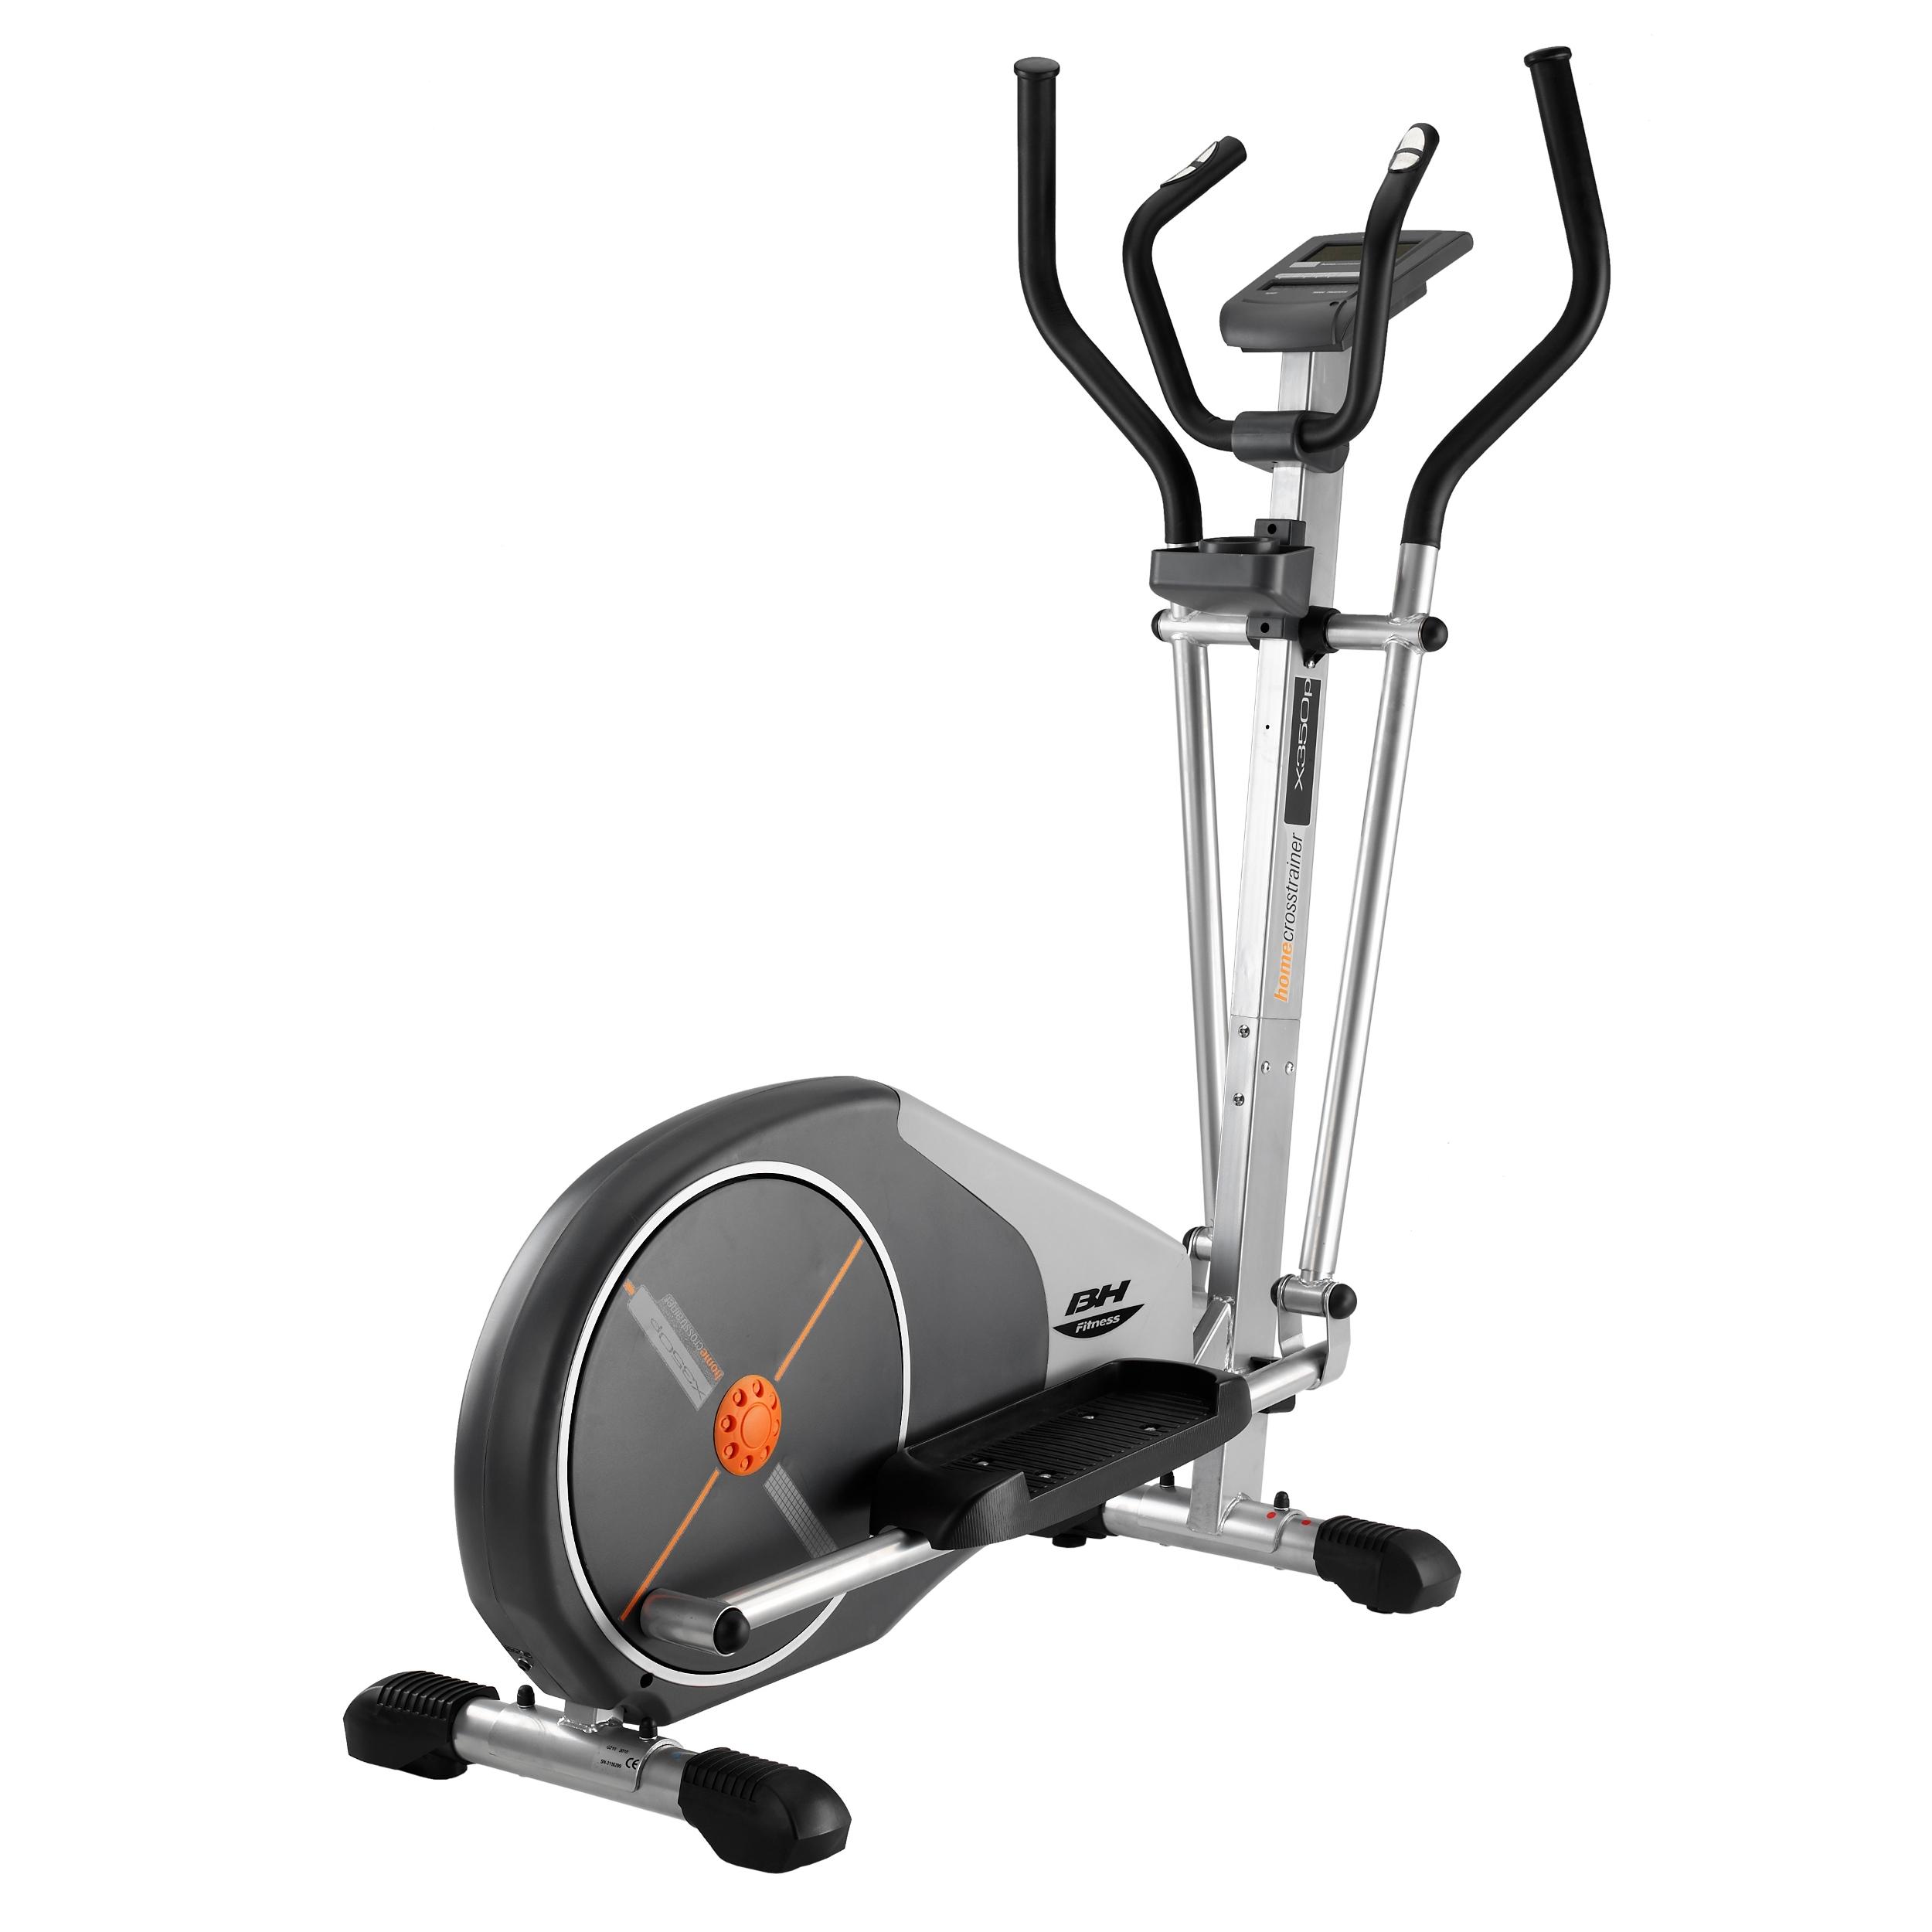 bh fitness lk8110 elliptical cross trainer. Black Bedroom Furniture Sets. Home Design Ideas